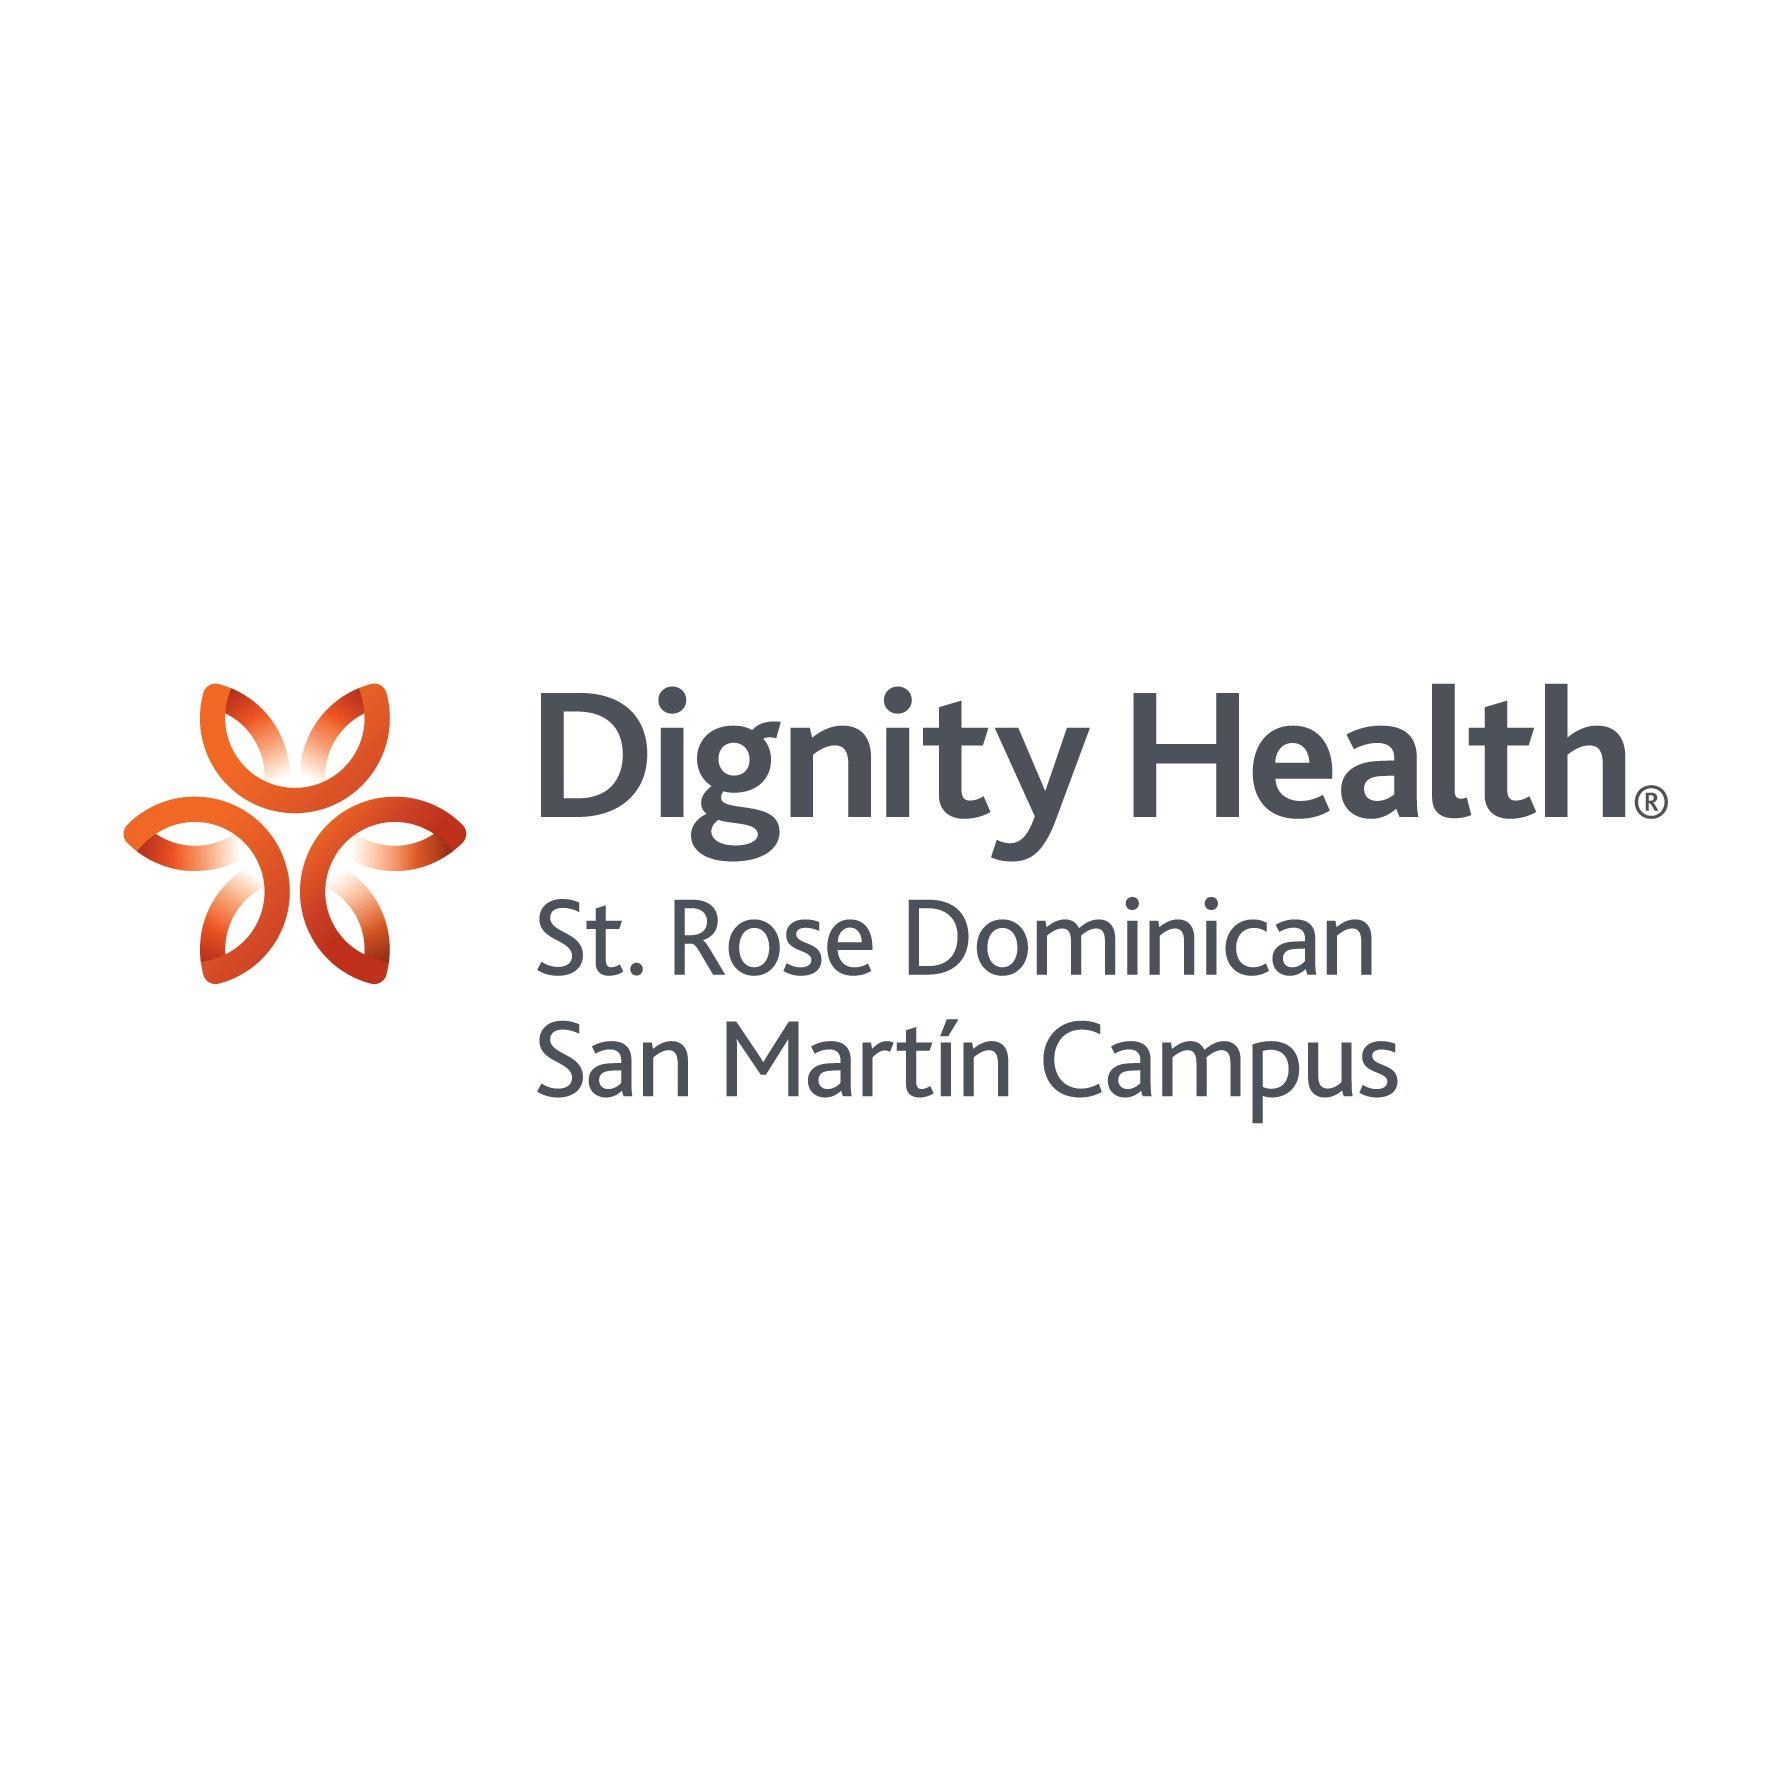 Emergency Room - Dignity Health - St. Rose Dominican, San Martin Campus - Las Vegas, NV